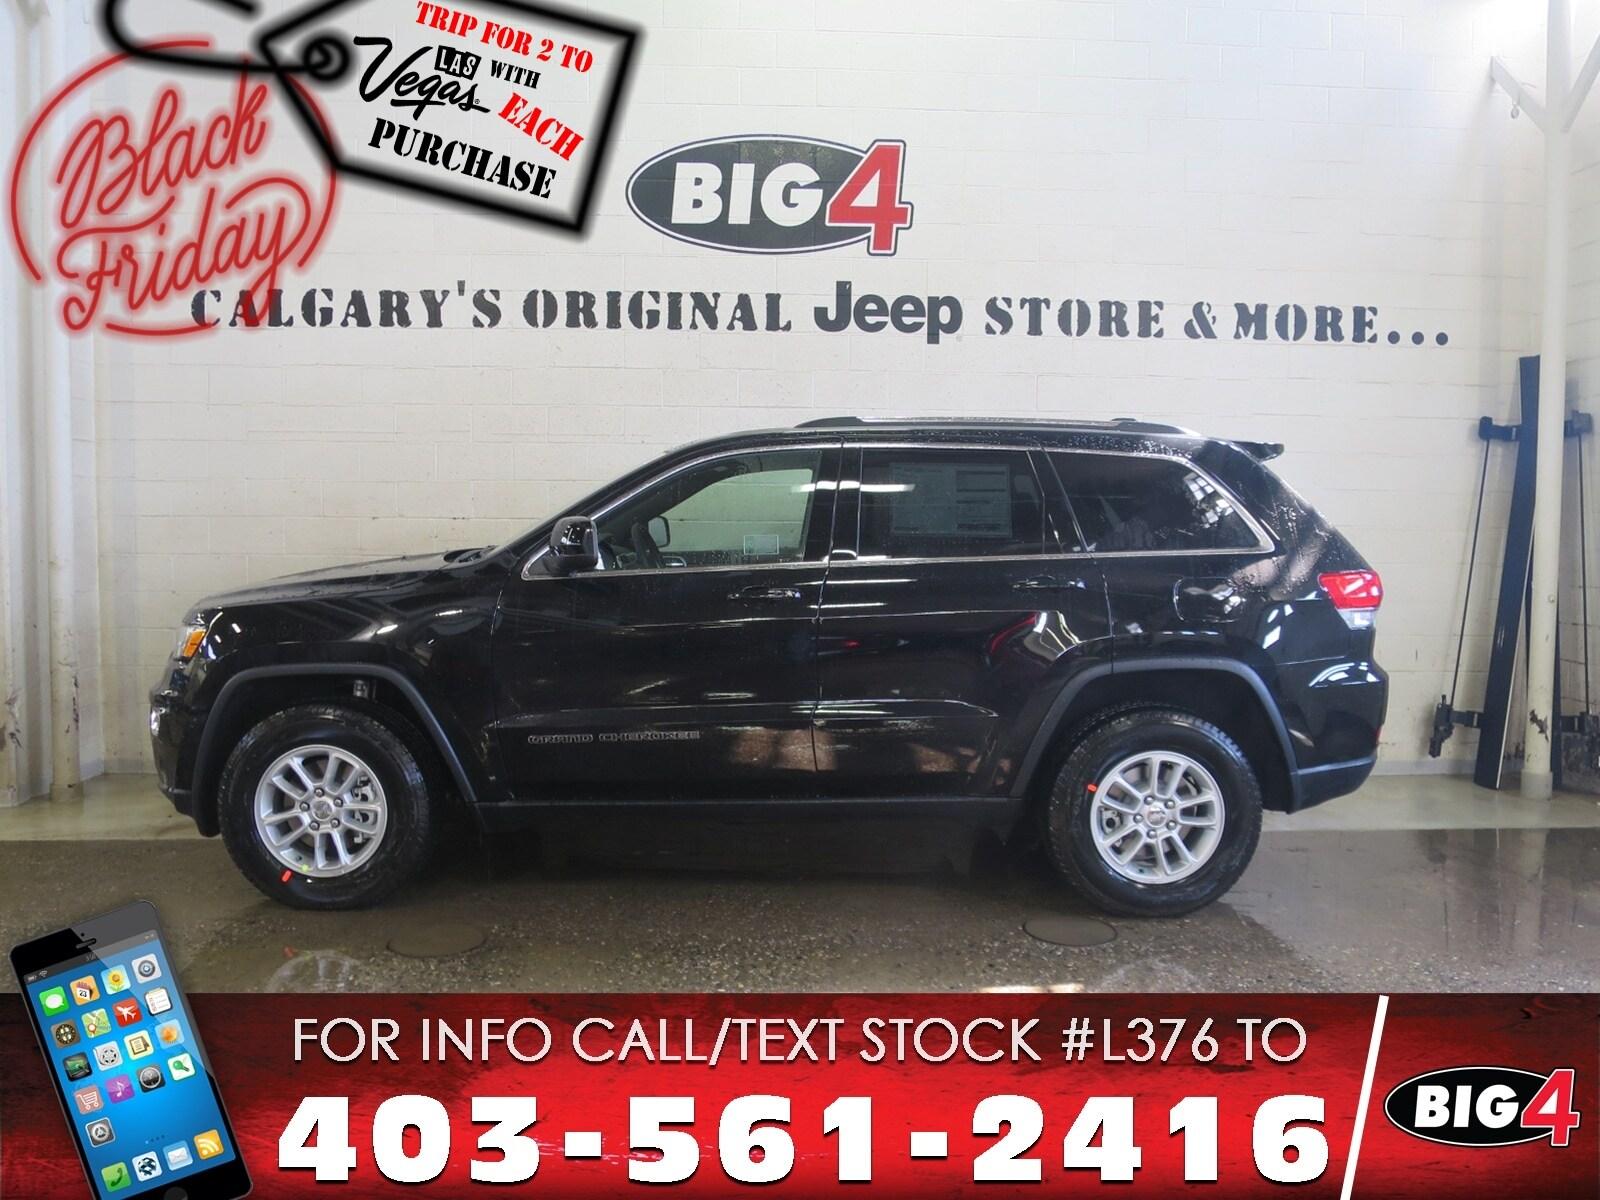 Used 2018 Jeep Grand Cherokee Laredo | V6 | Pwr Driver seat | 4x4 SUV Calgary, AB